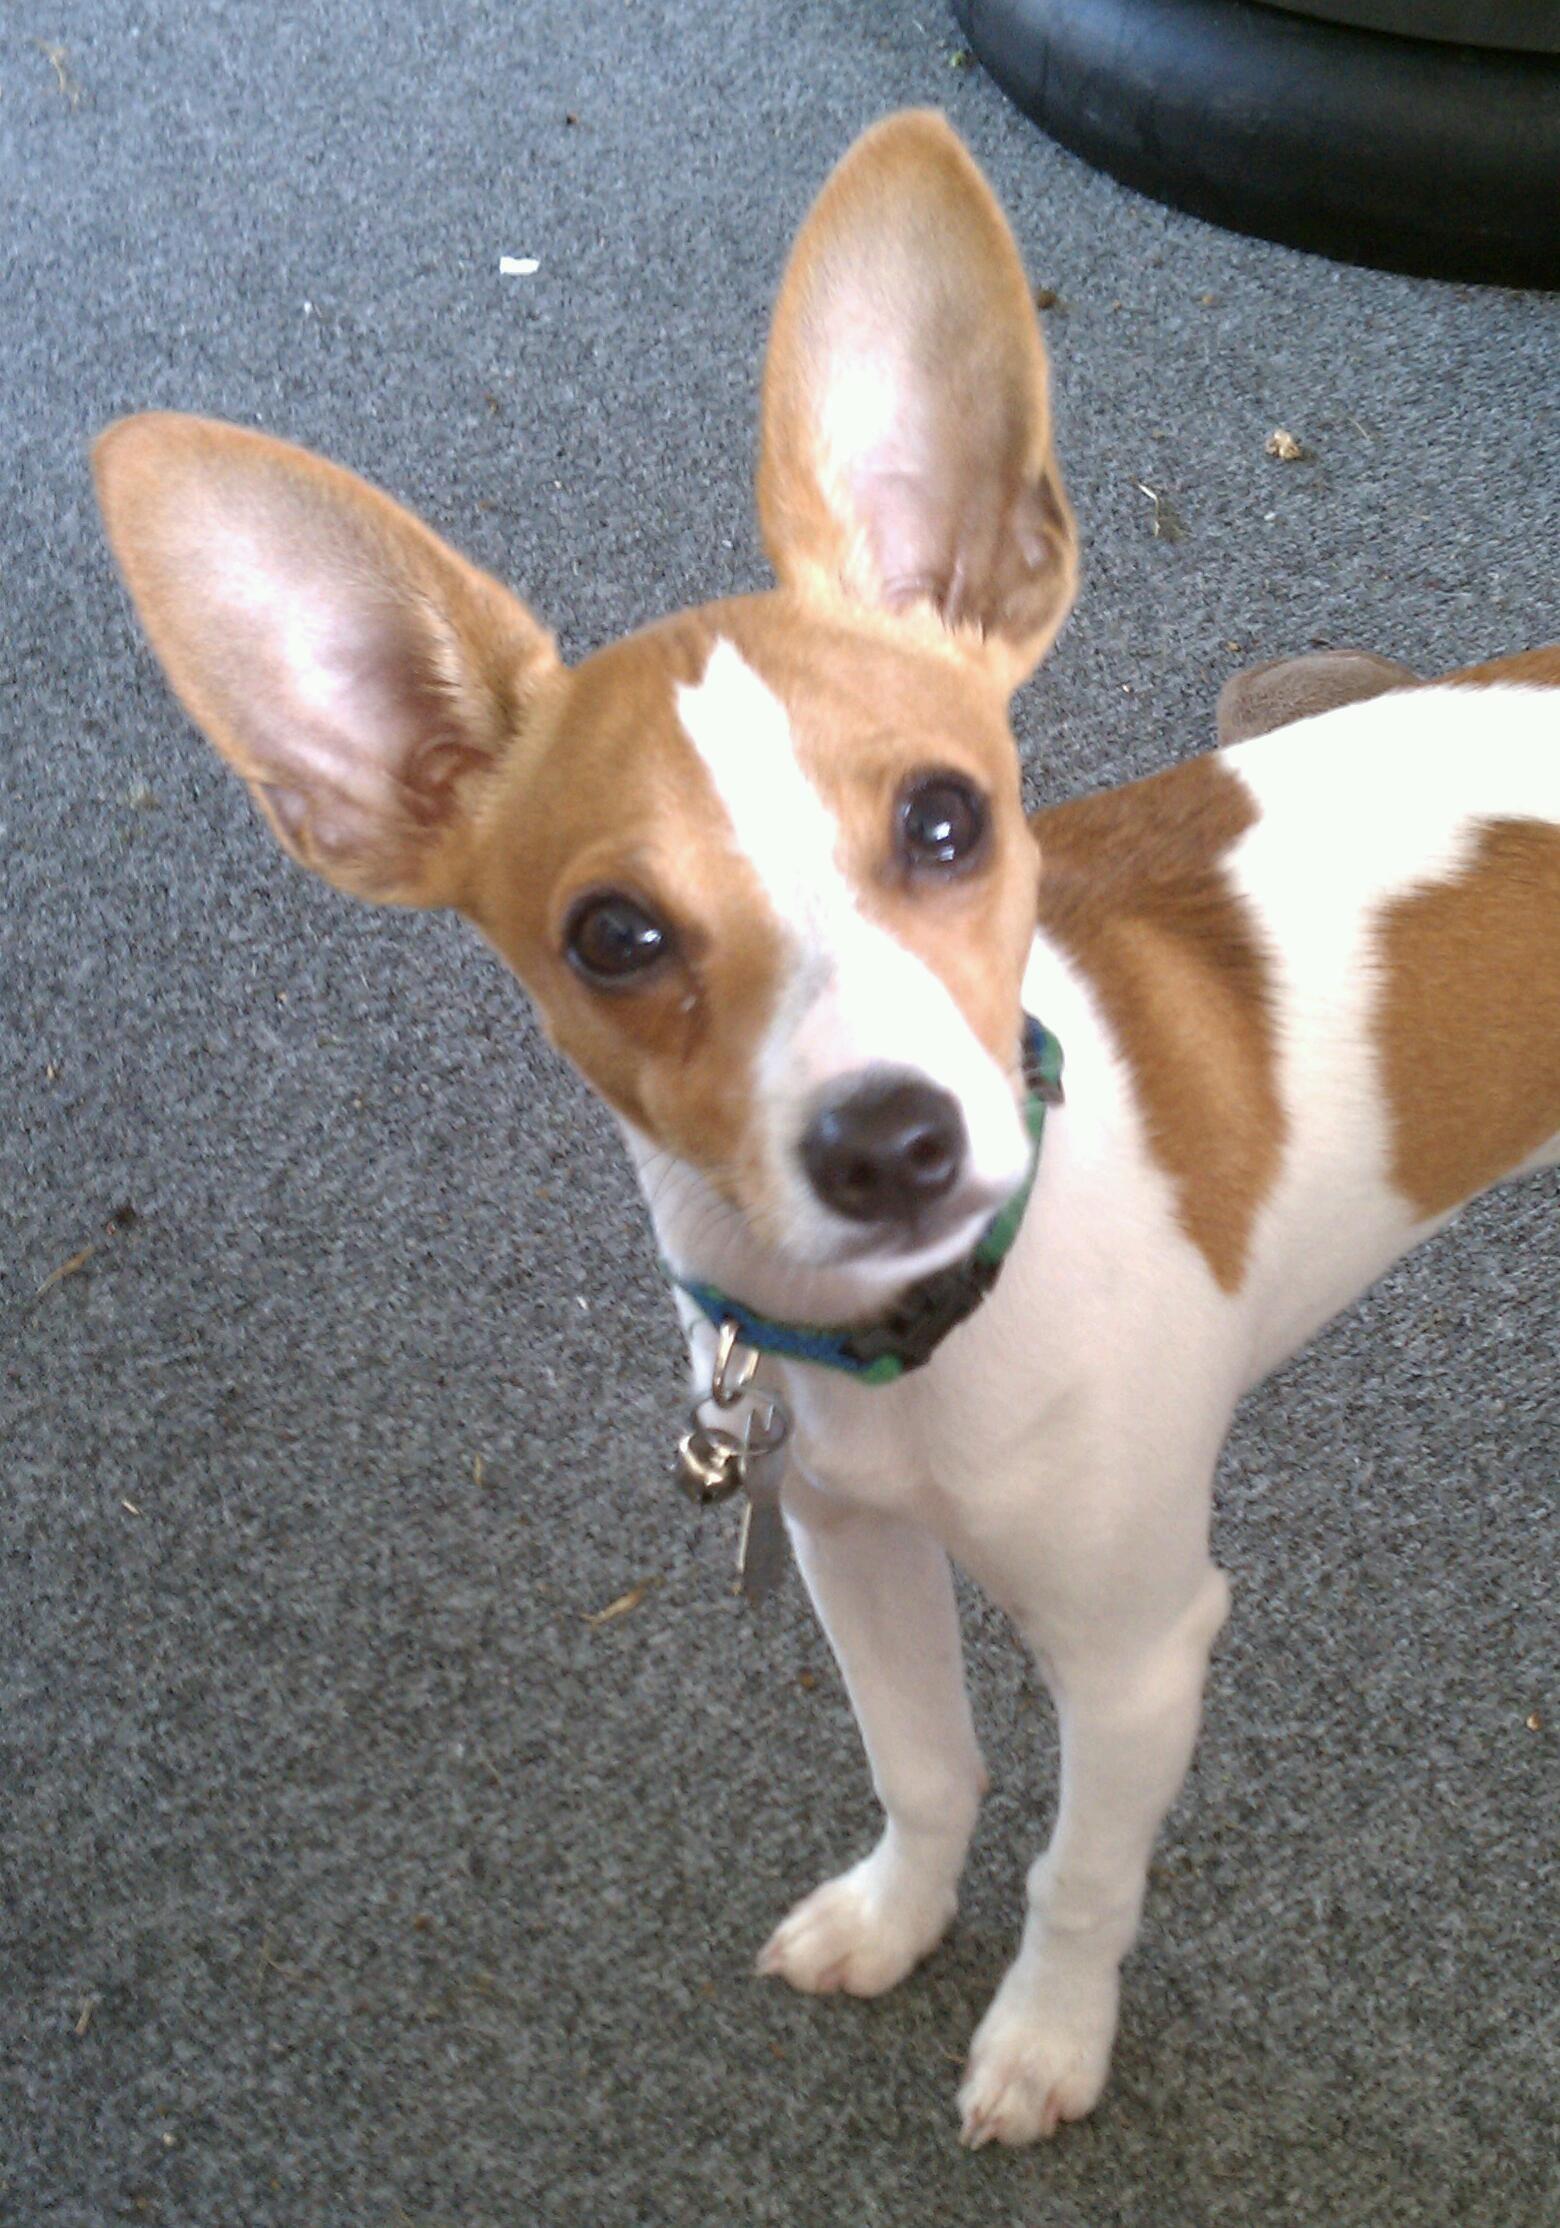 My Jax A Toy Rat Terrier At 5 Months Ratties Pinterest Rat